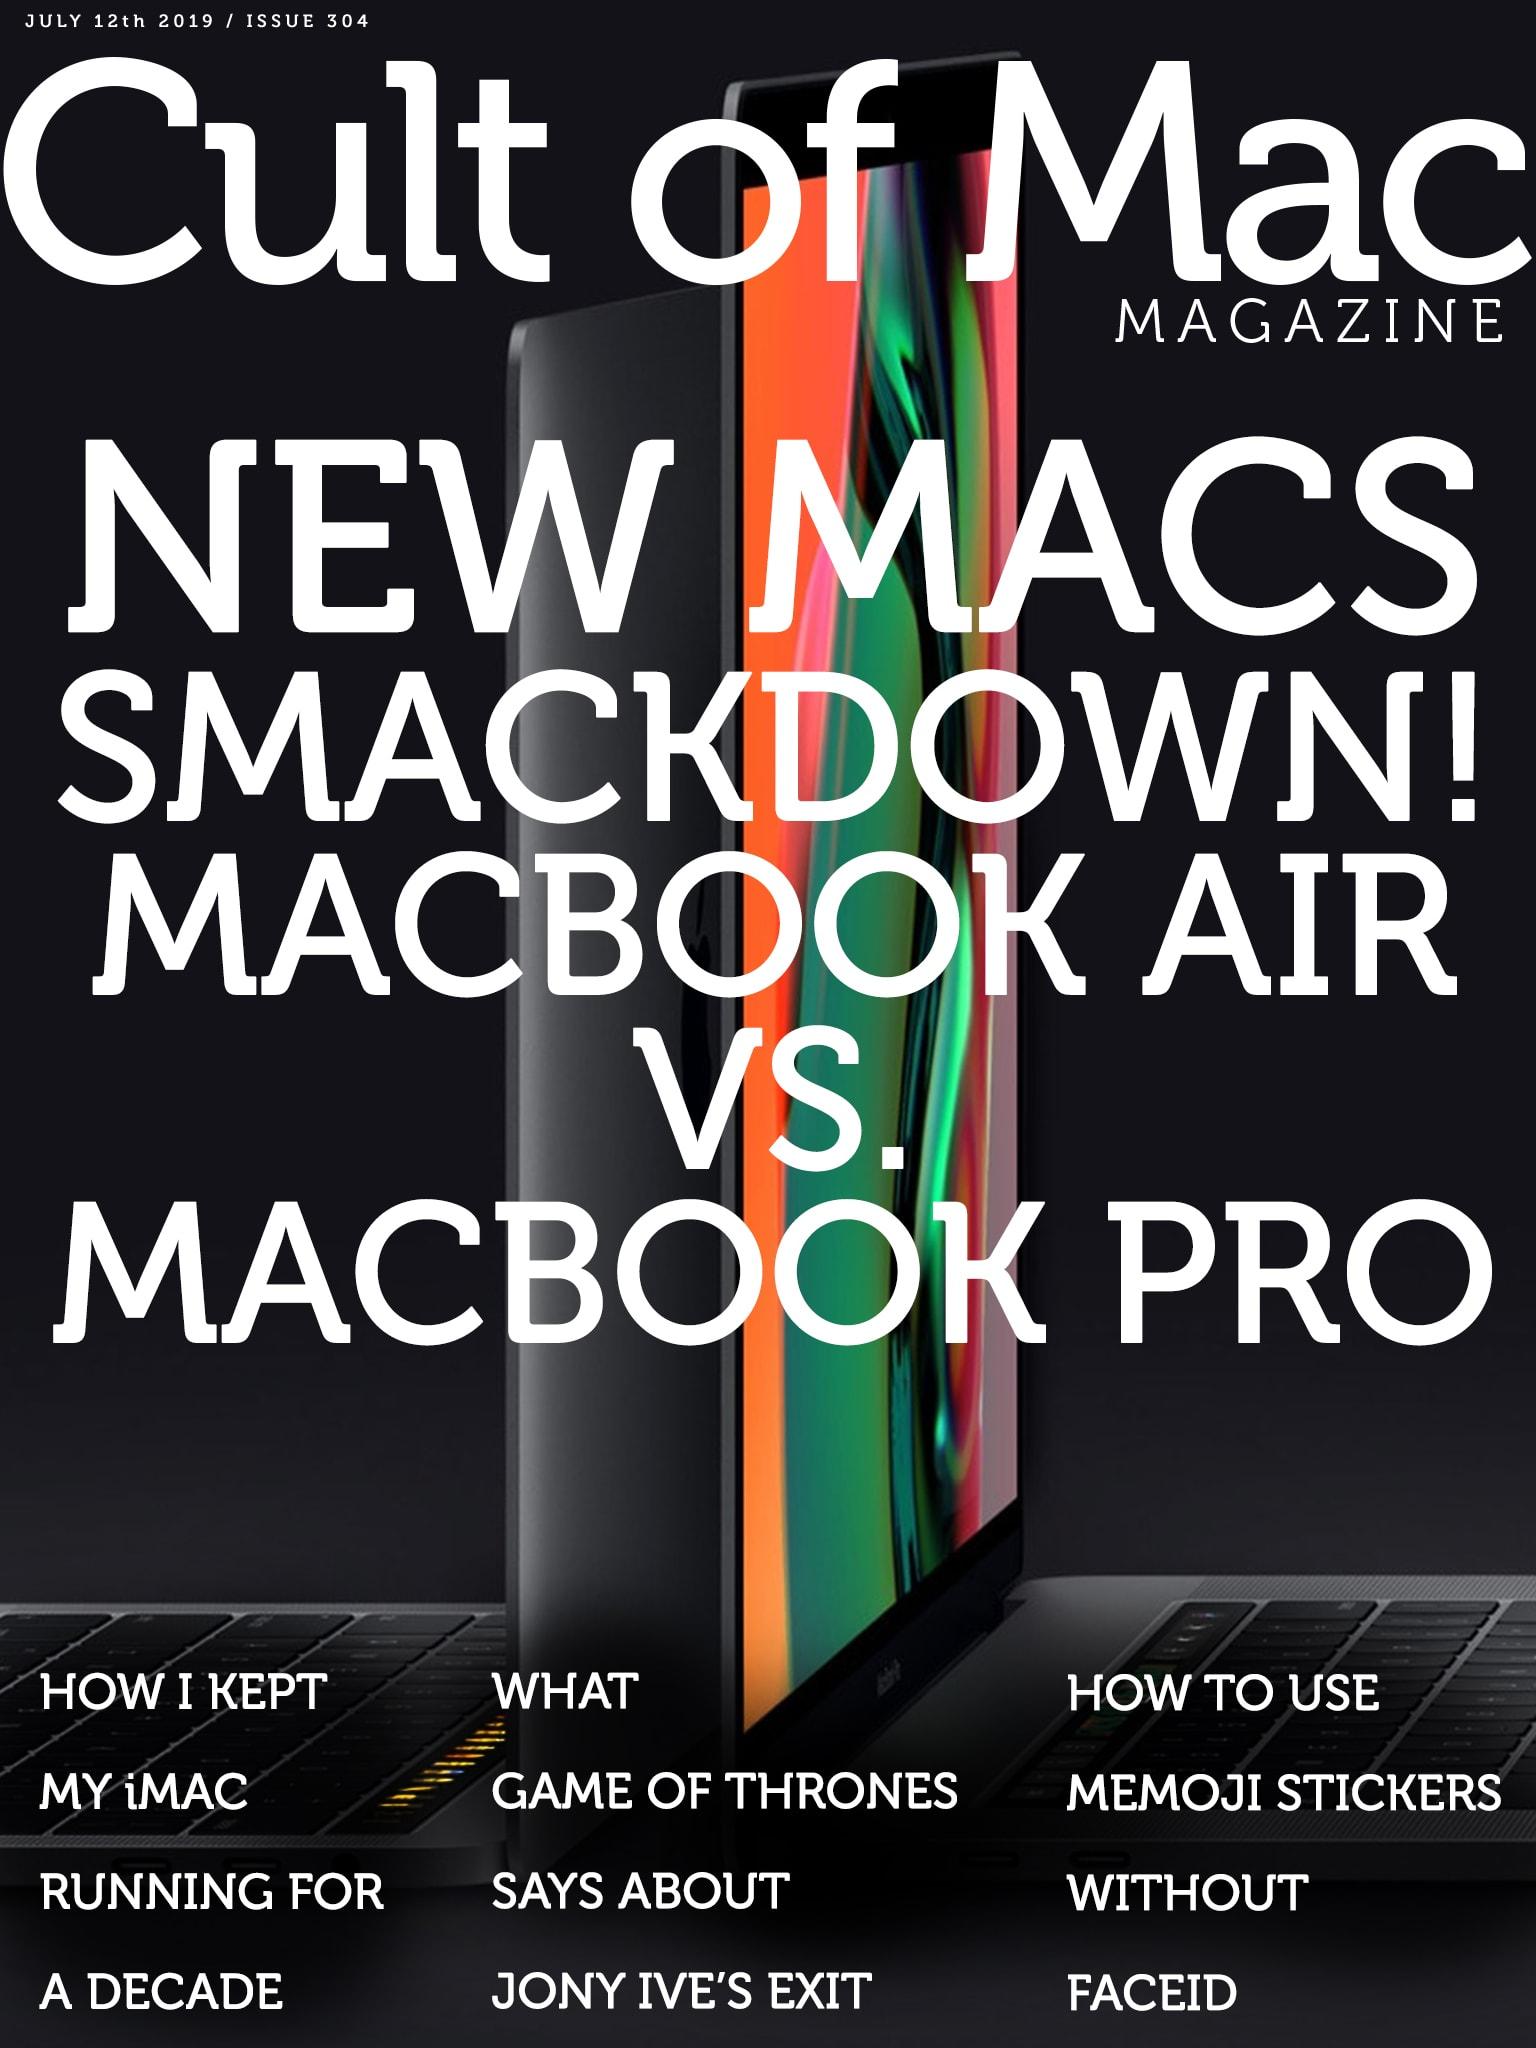 New Macs smackdown in Cult of Mac Magazine No. 304